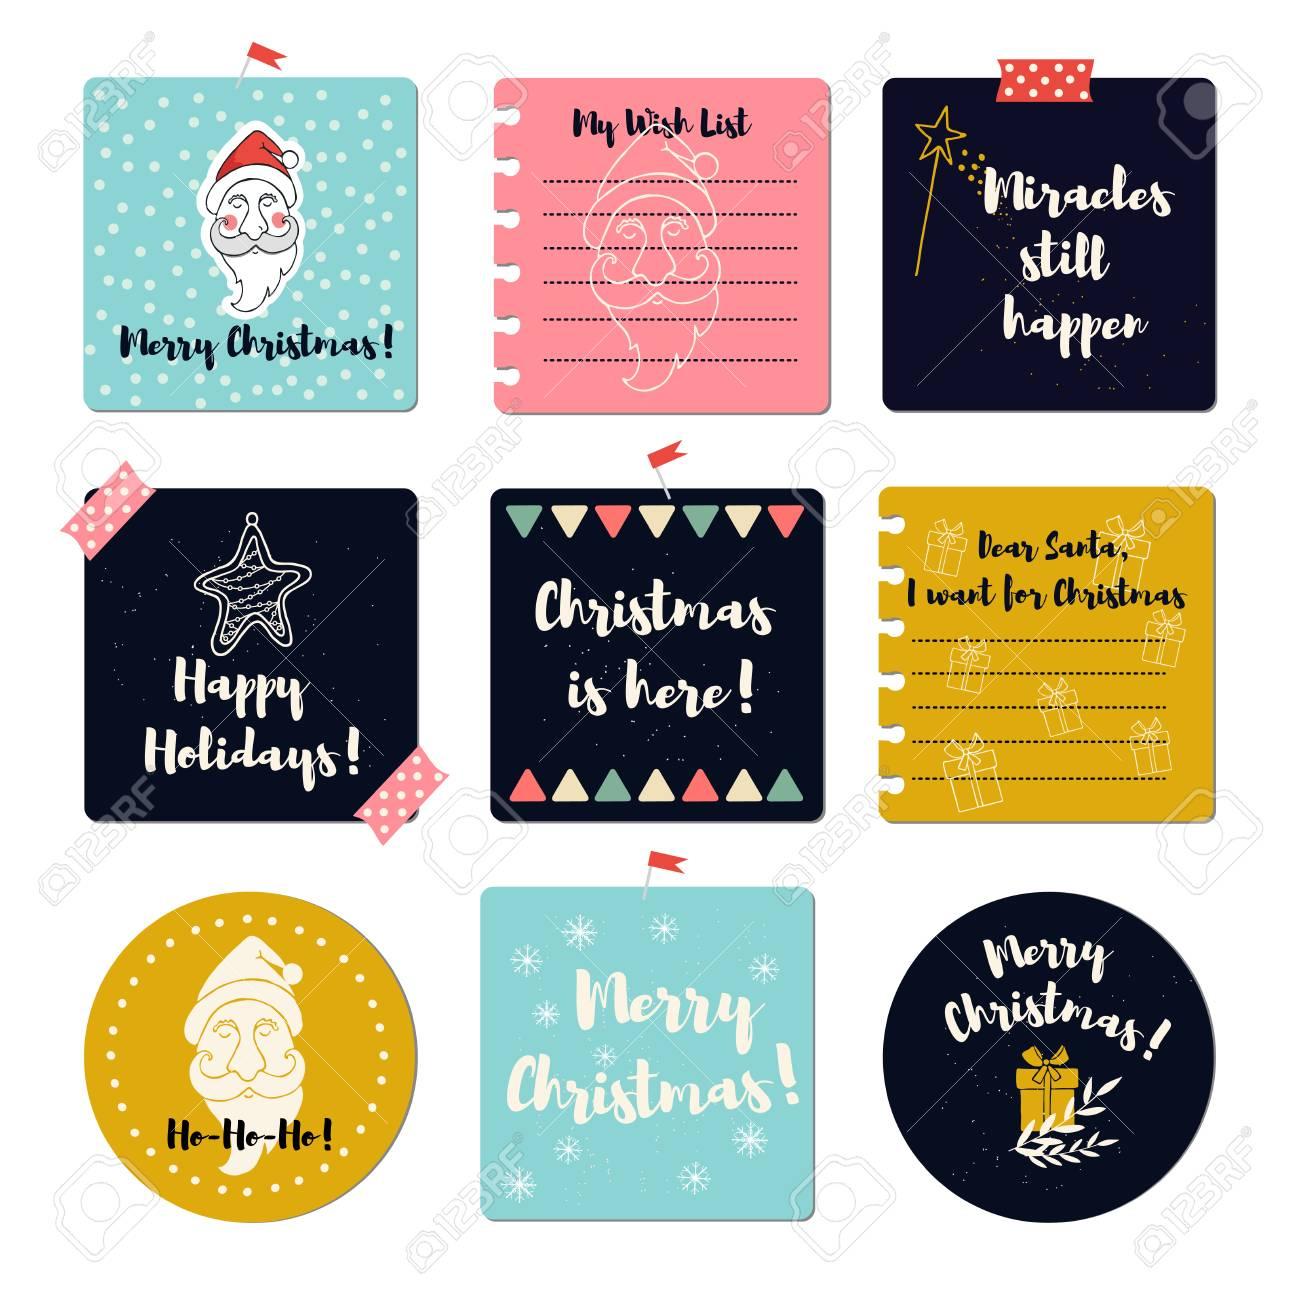 Merry Christmas Greeting Cards Season Greeting Cards Templates